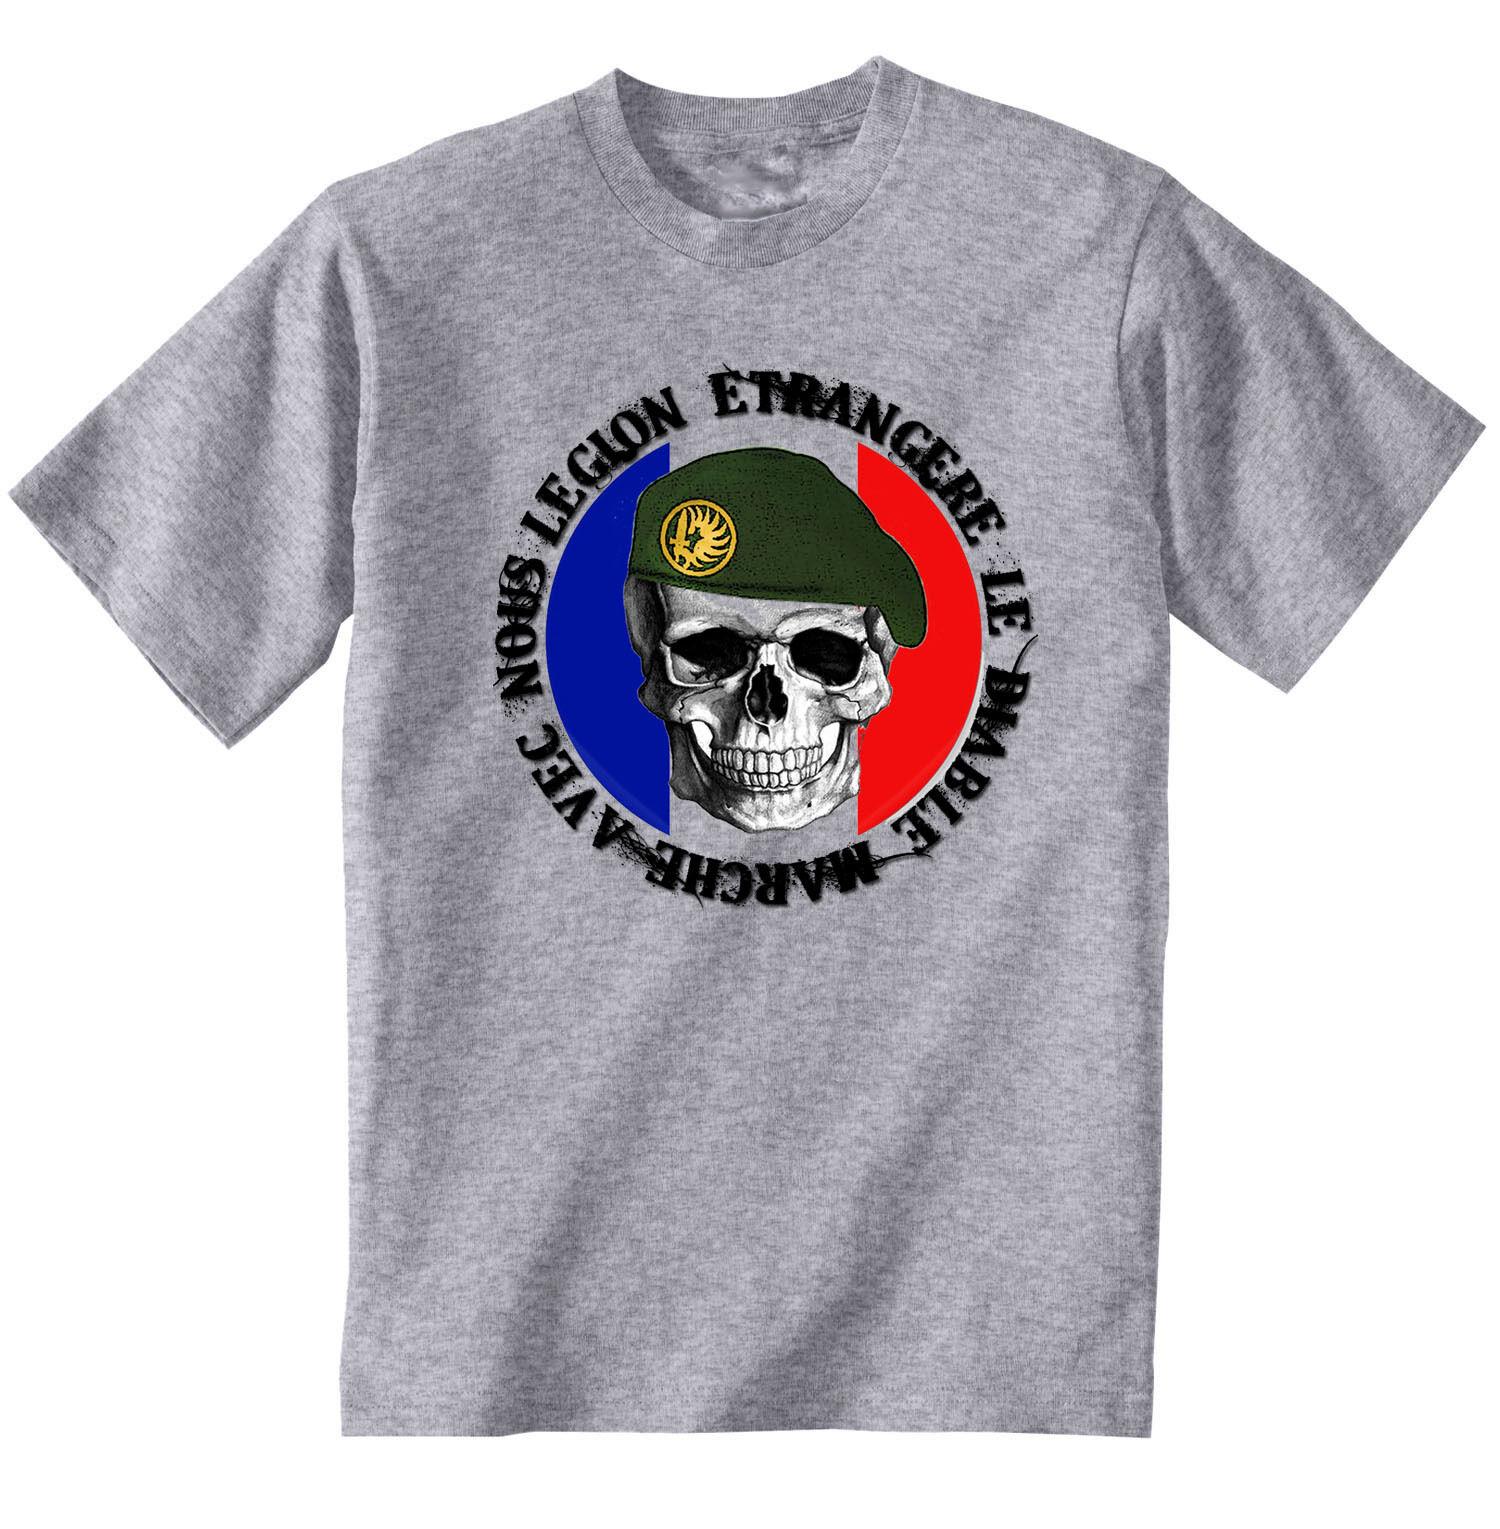 TEESQUARE1st Mens French Legion Etrangere Grey Sweatshirt